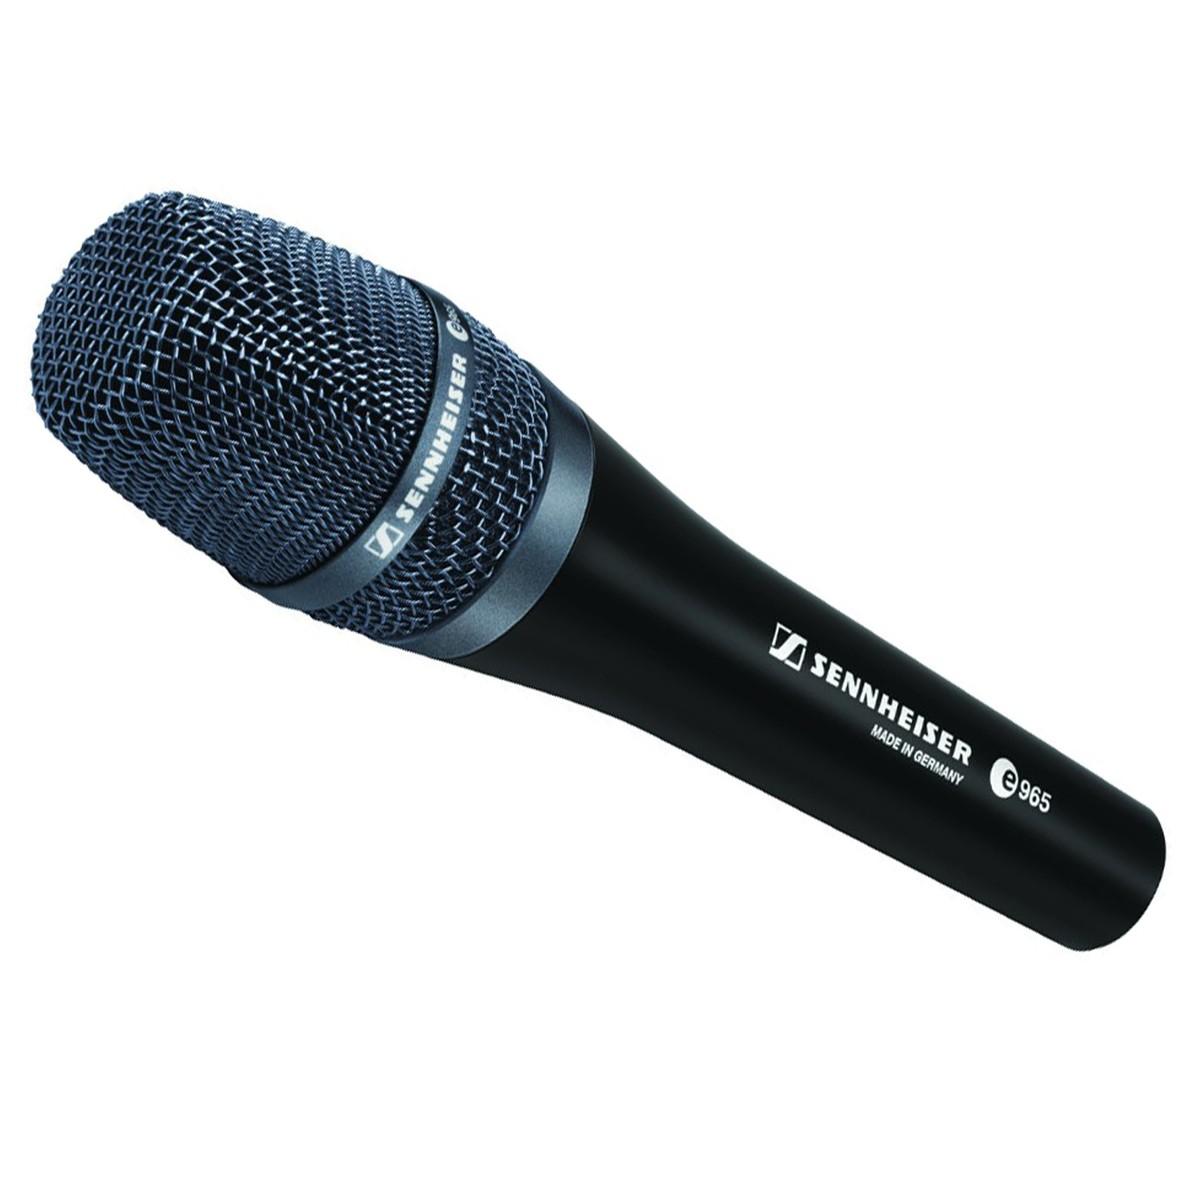 sennheiser e965 condenser vocal microphone at gear4music. Black Bedroom Furniture Sets. Home Design Ideas